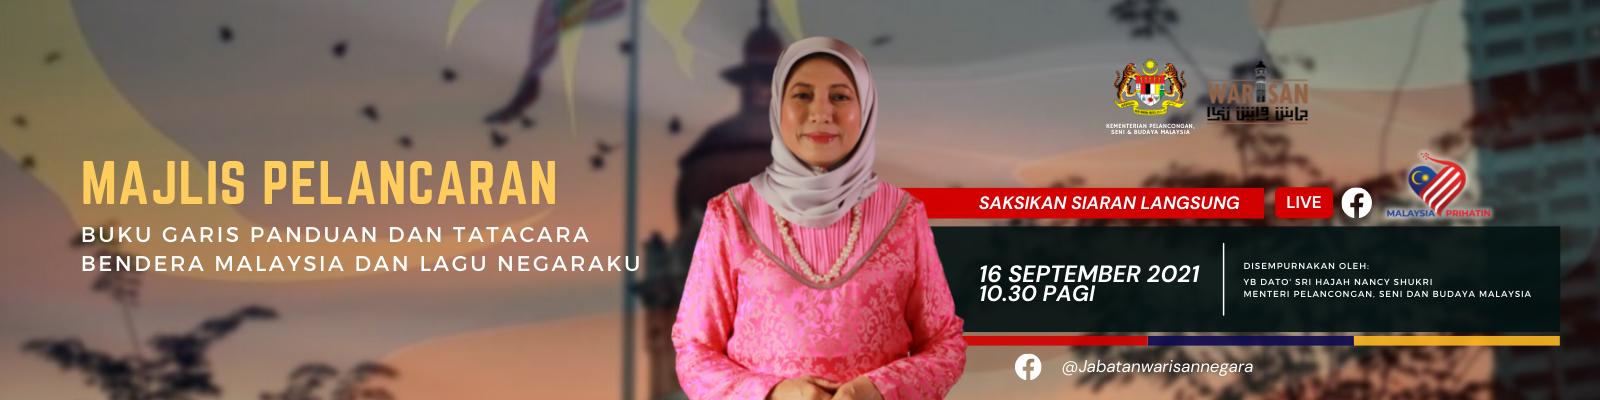 KEMENTERIAN_PELANCONGAN_SENI__BUDAYA_MALAYSIA_WEBSITE2.png